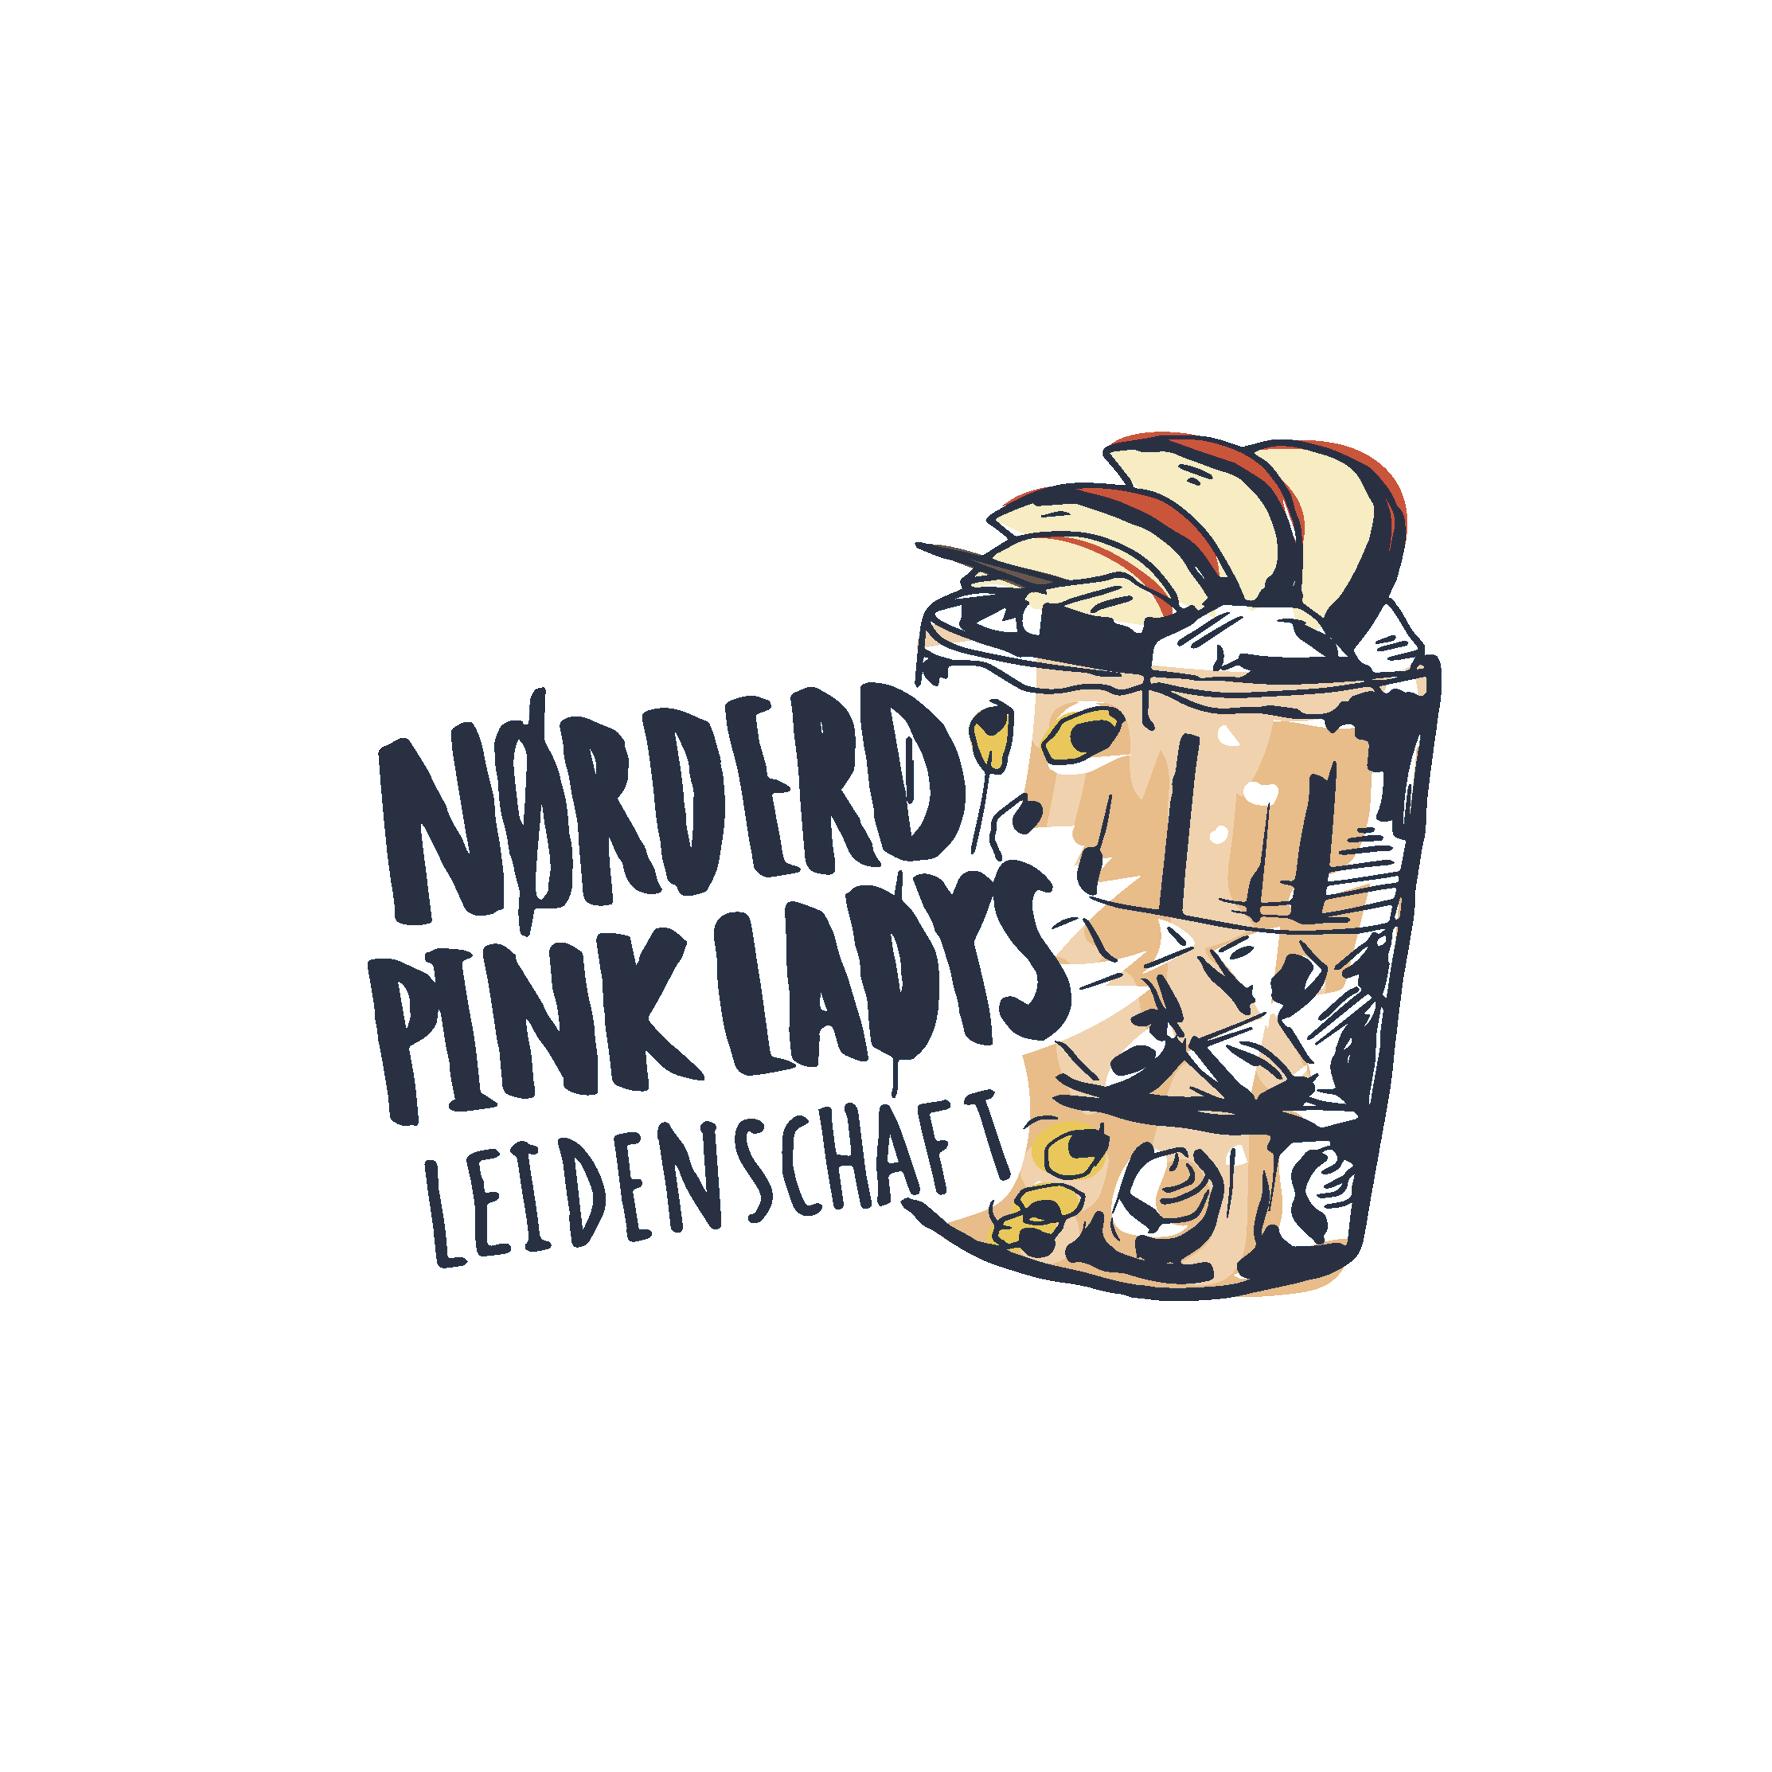 Cocktail Pink Ladys Leidenschaft